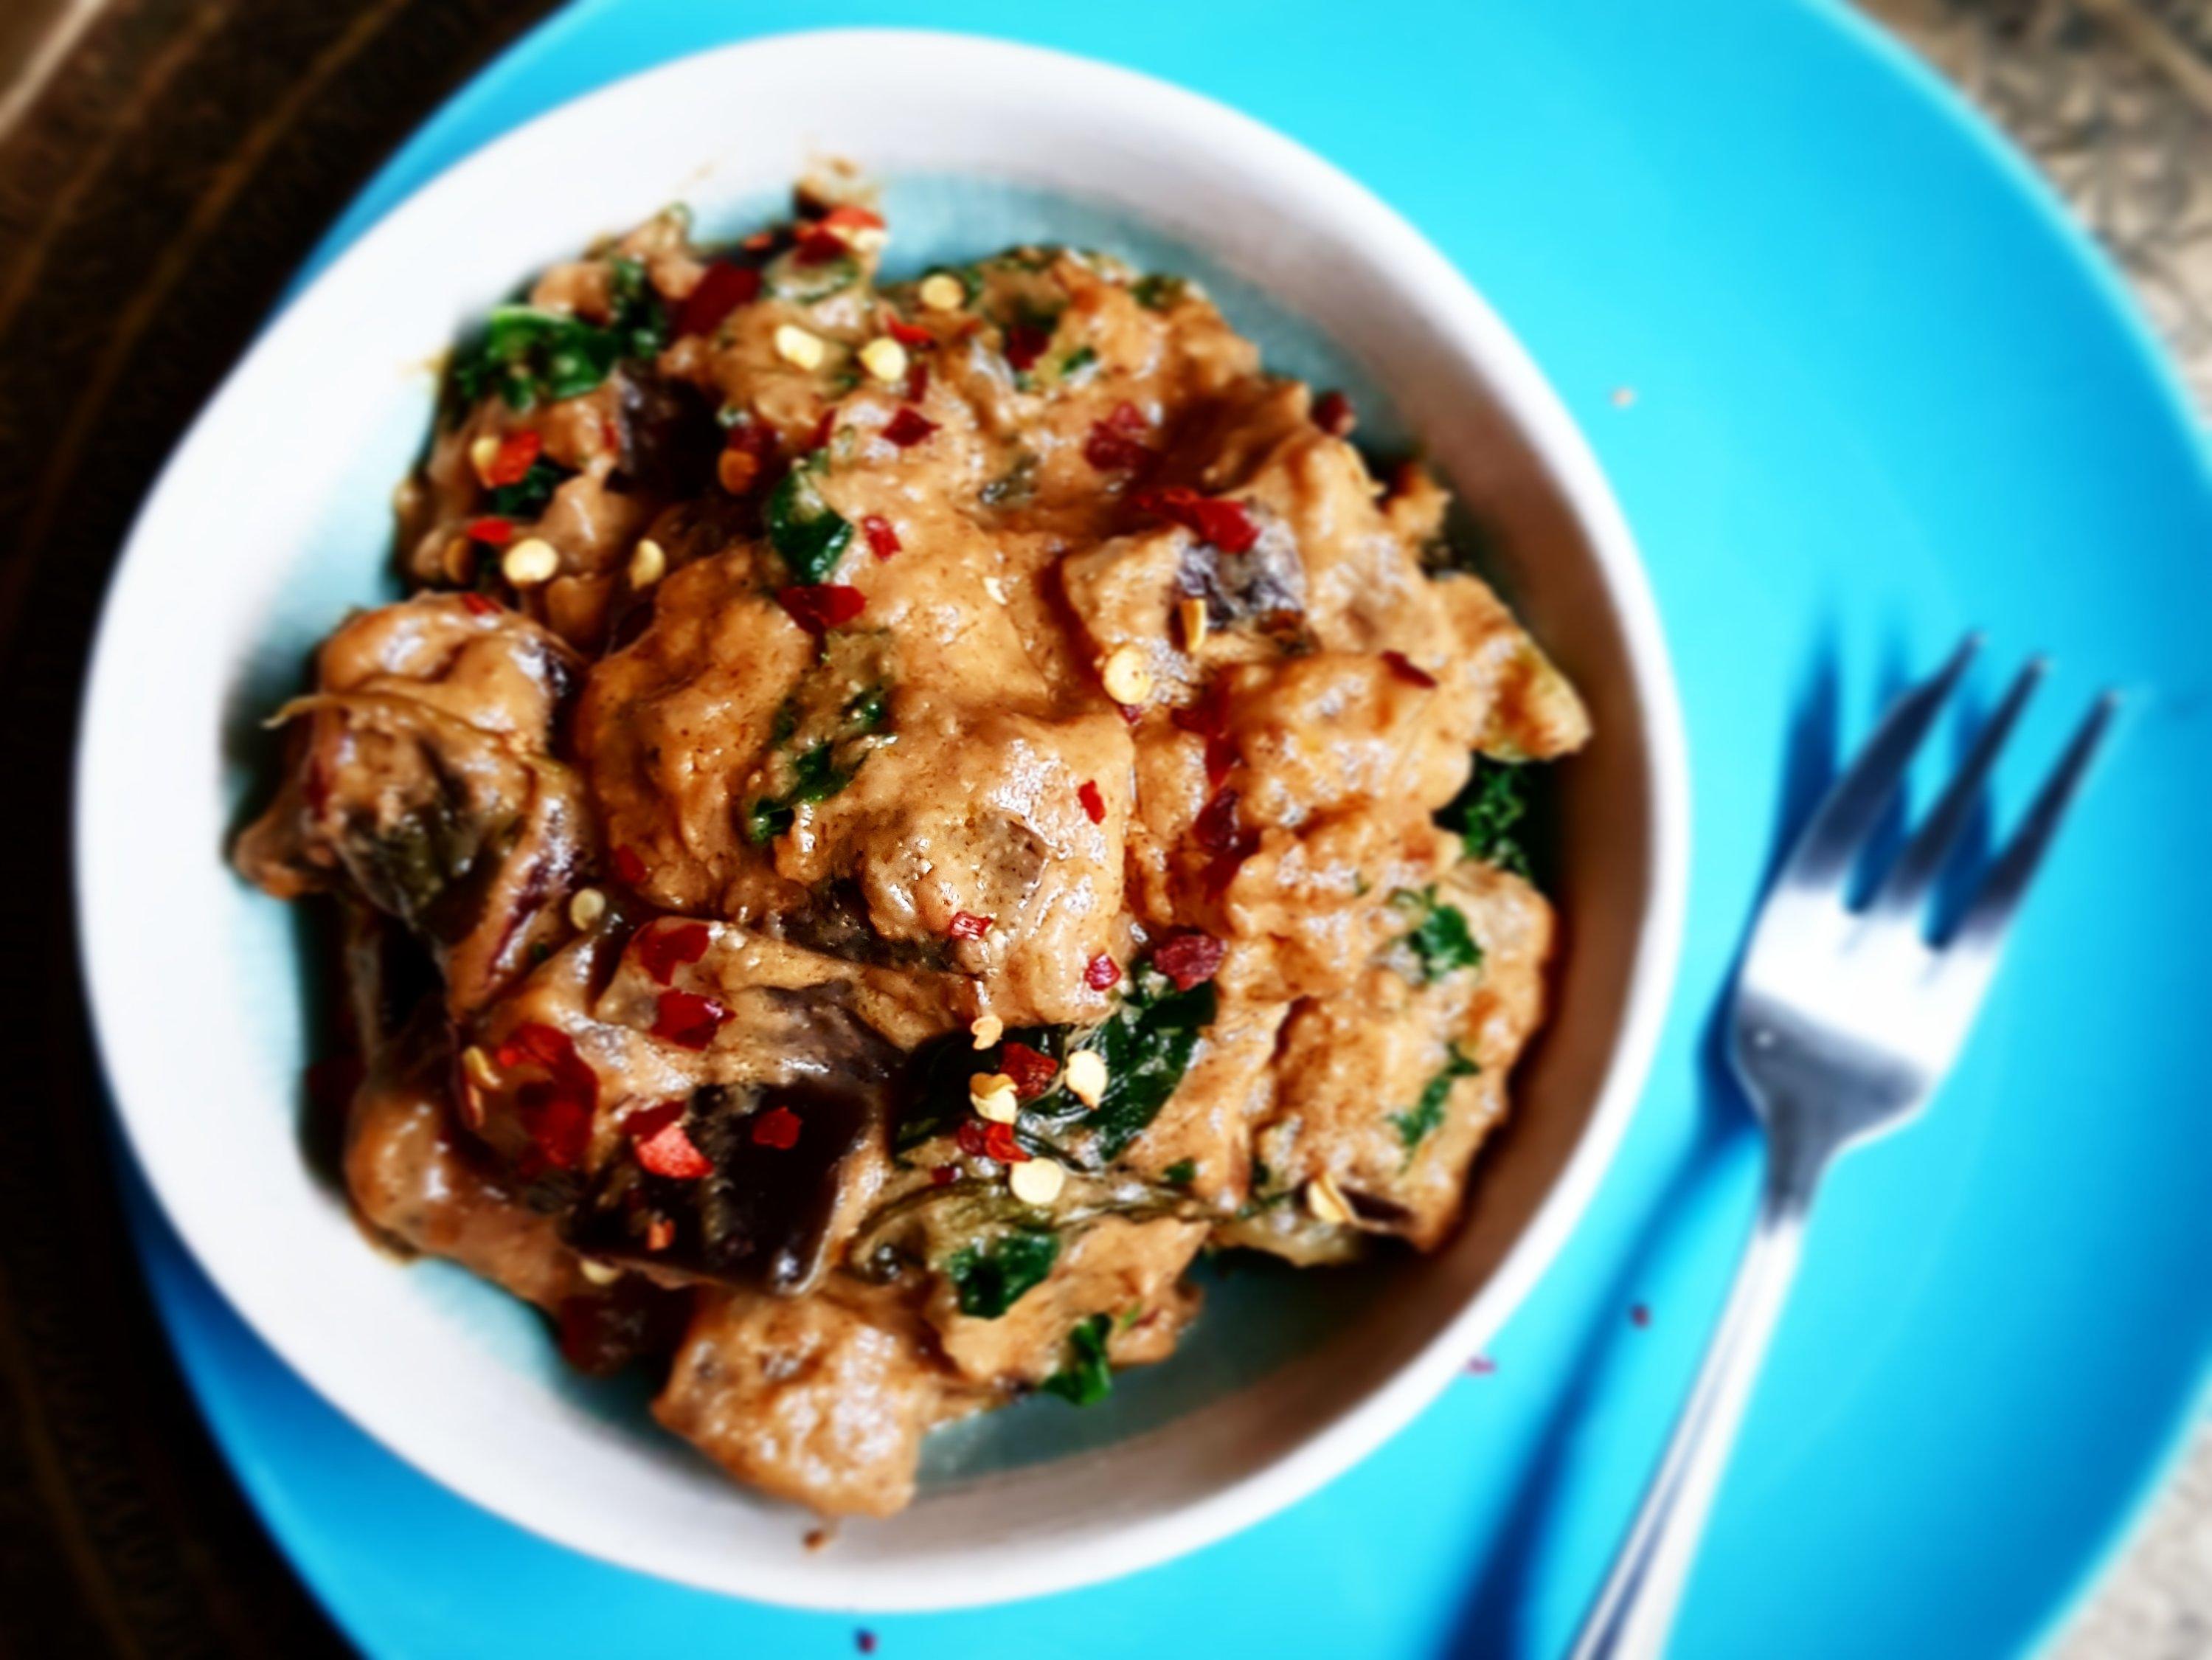 Aubergine & Kale Satay recipe by Jack Monroe